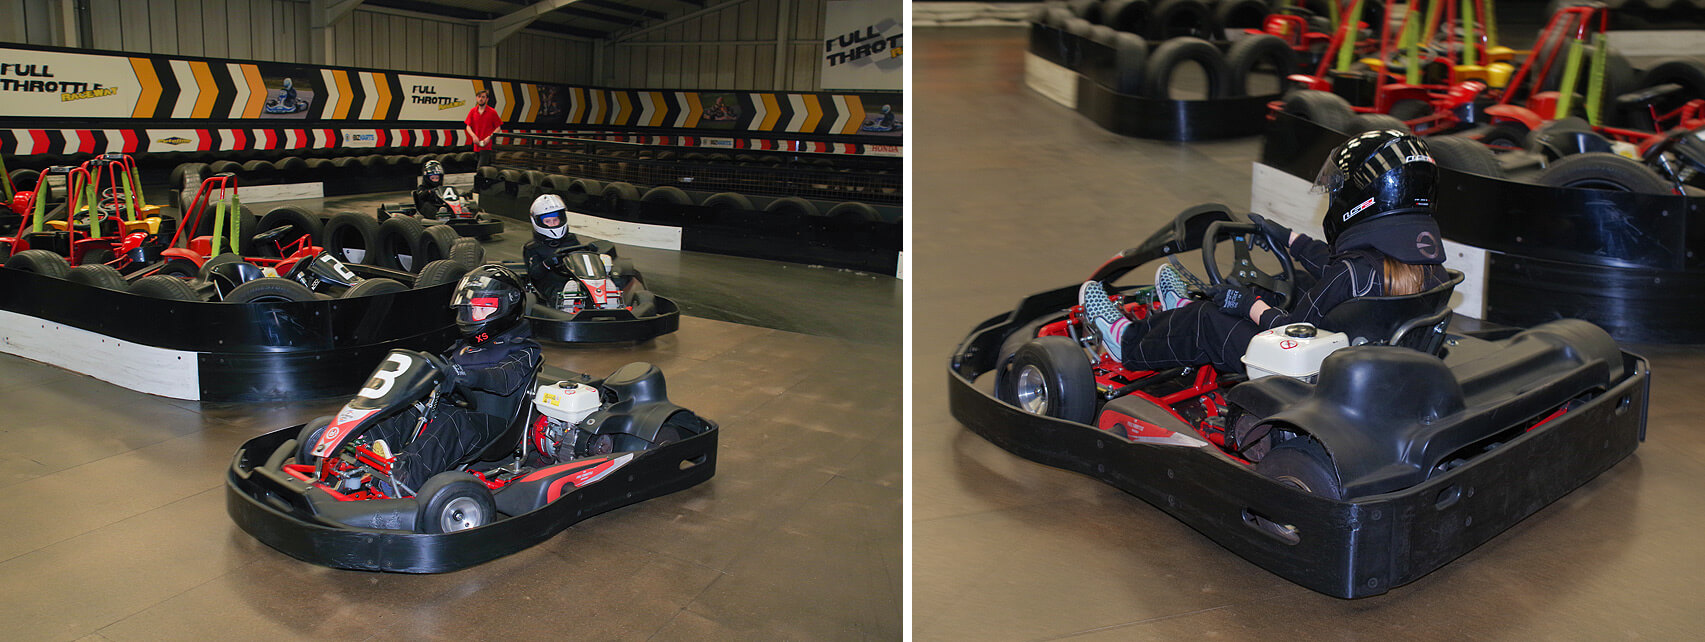 Kids Go Karting Stourbridge | Cadet Raceway